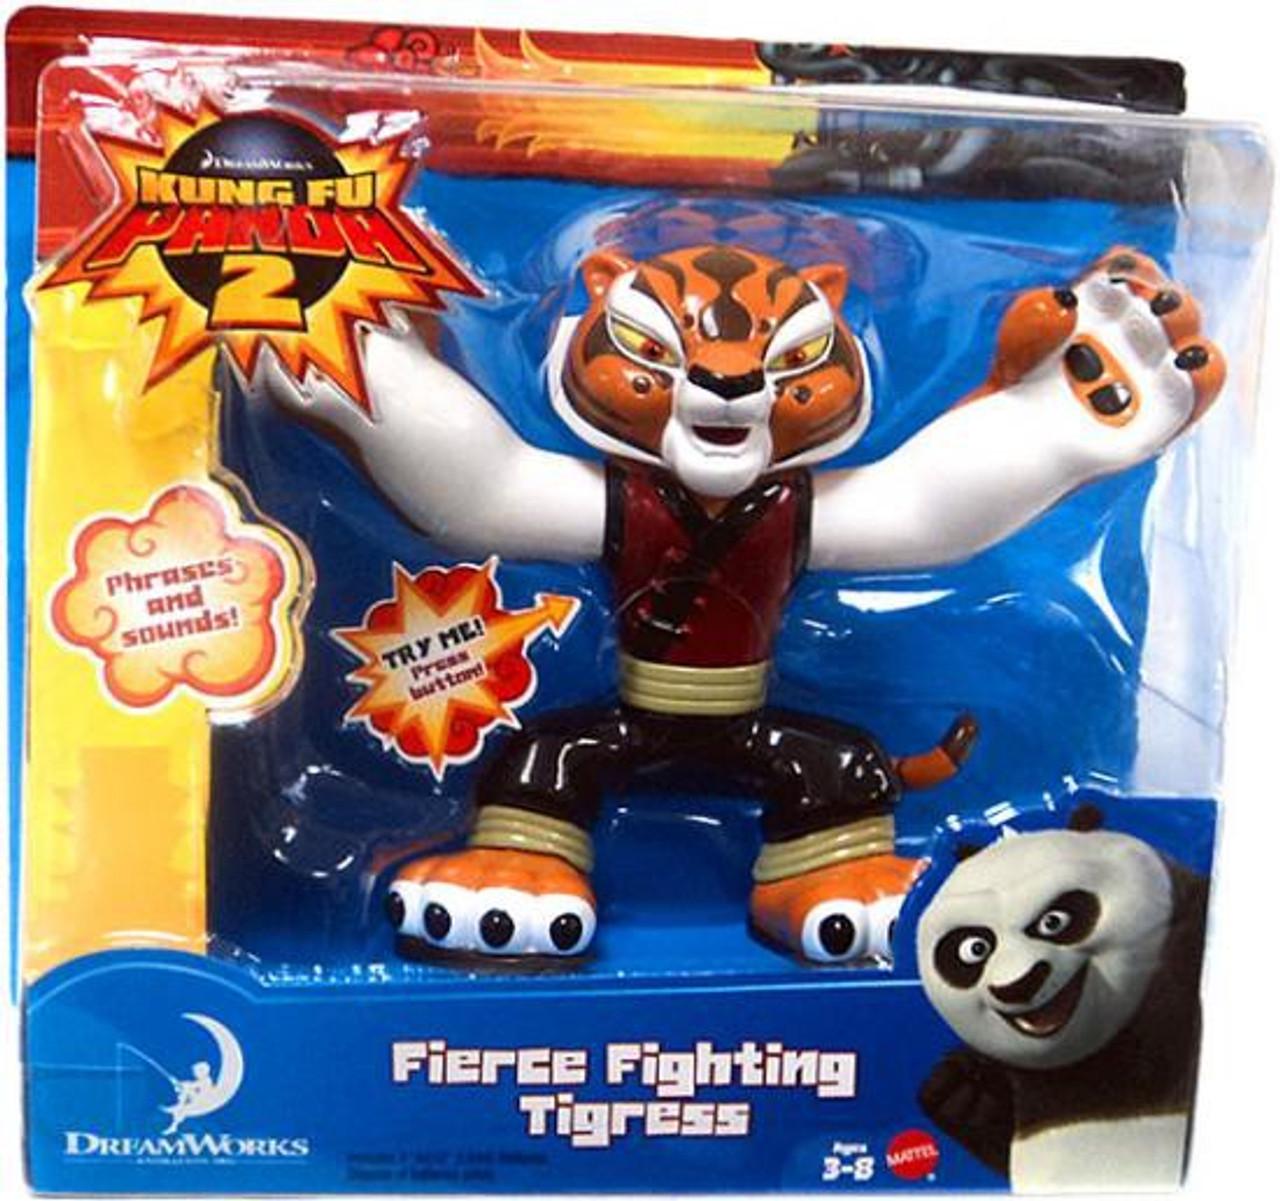 Kung Fu Panda 2 Tigress Action Figure Fierce Fighting Mattel Toys